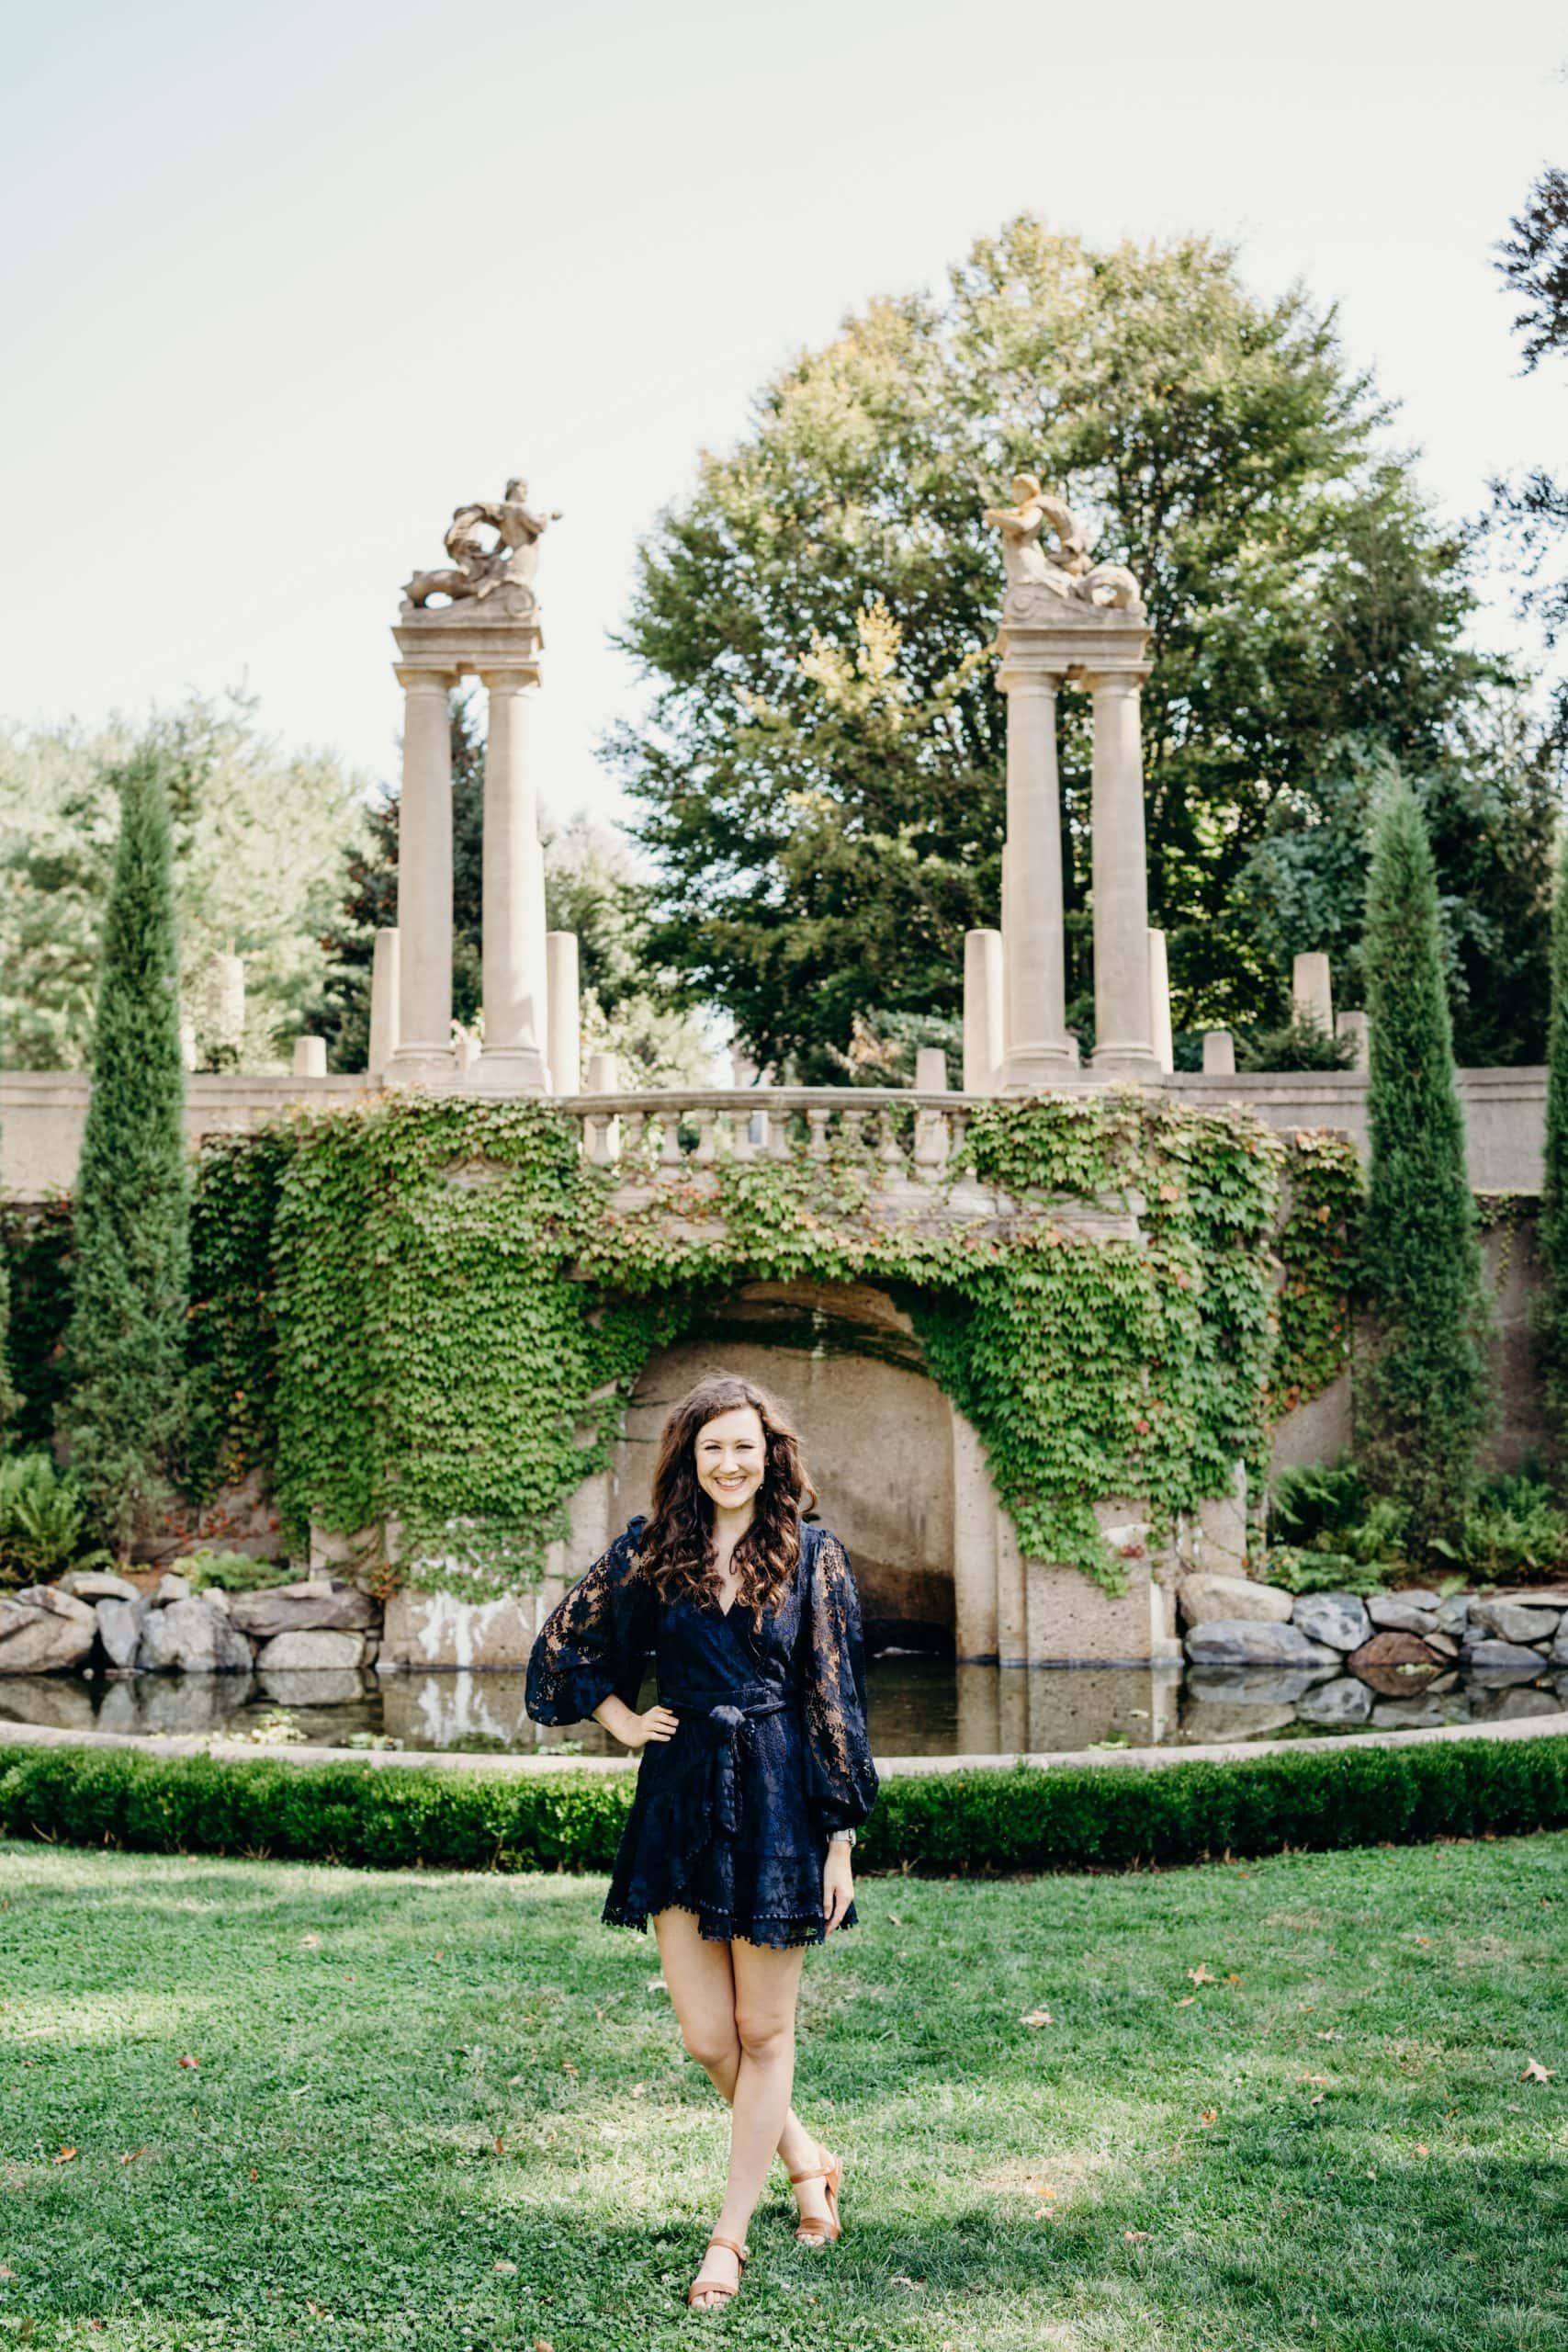 photographer Meghan Lynch at the crane estate